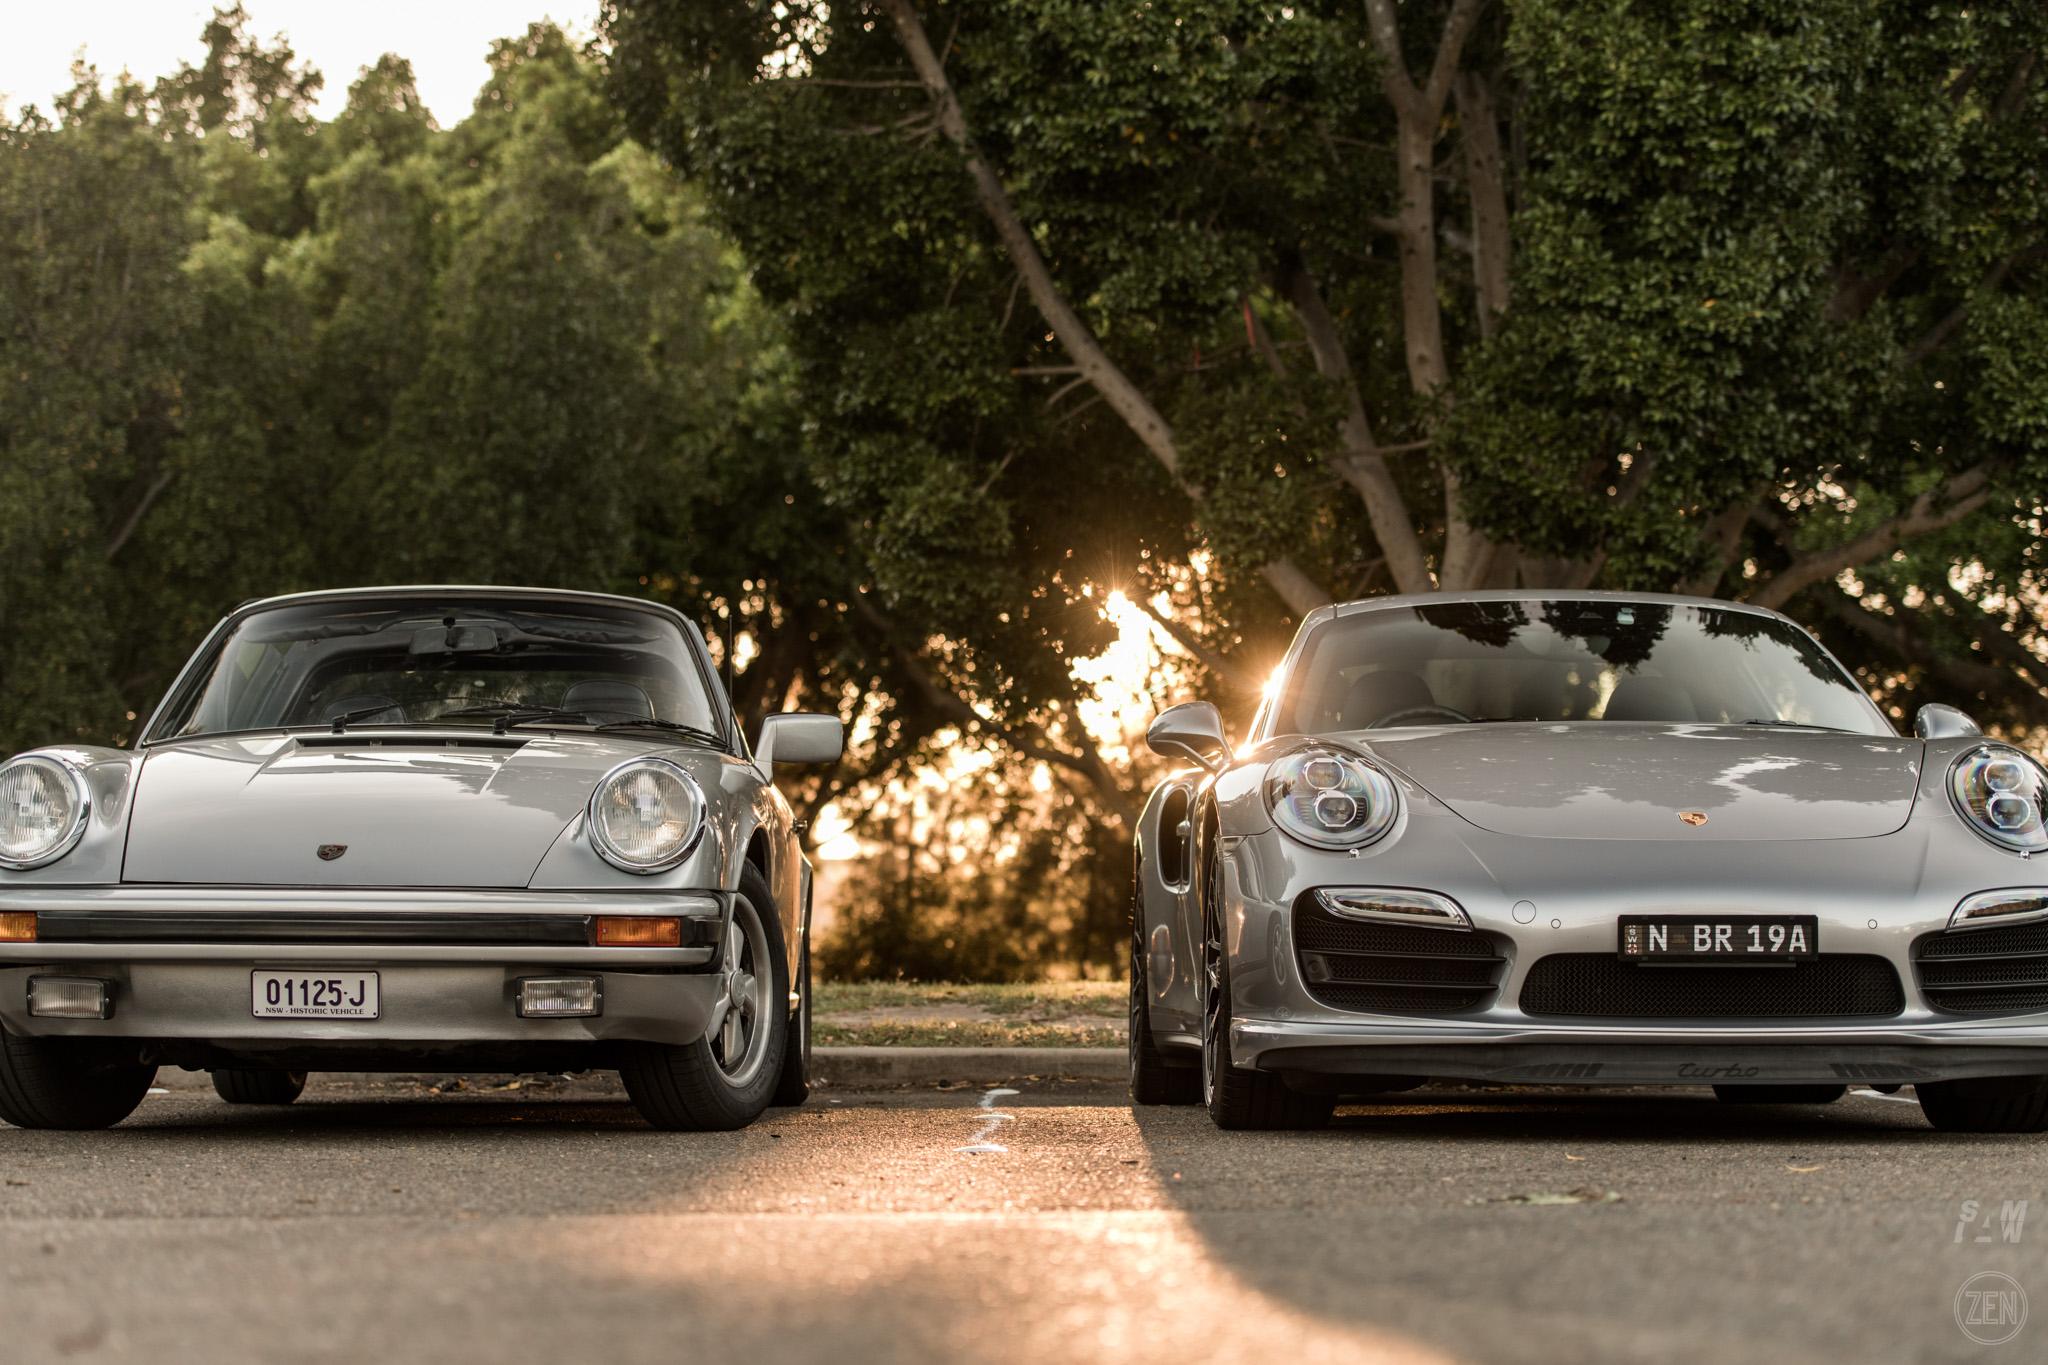 2019-10-27 - Autohaus Porsches & Coffee 020